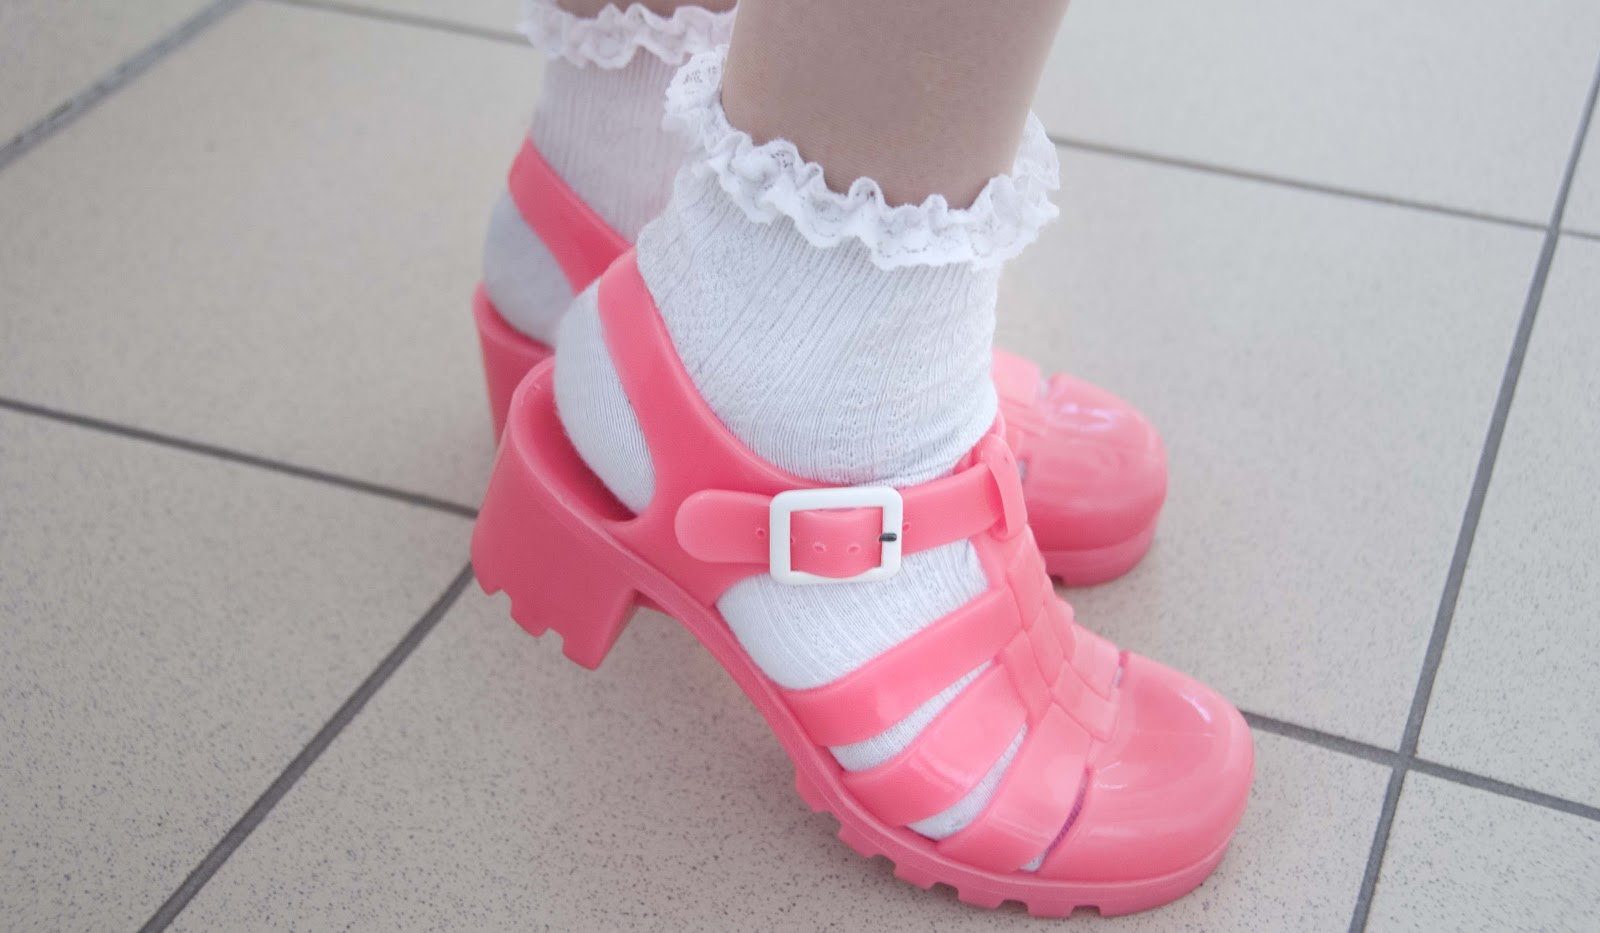 Страпон janine s harness amp pink jelly 27 фотография